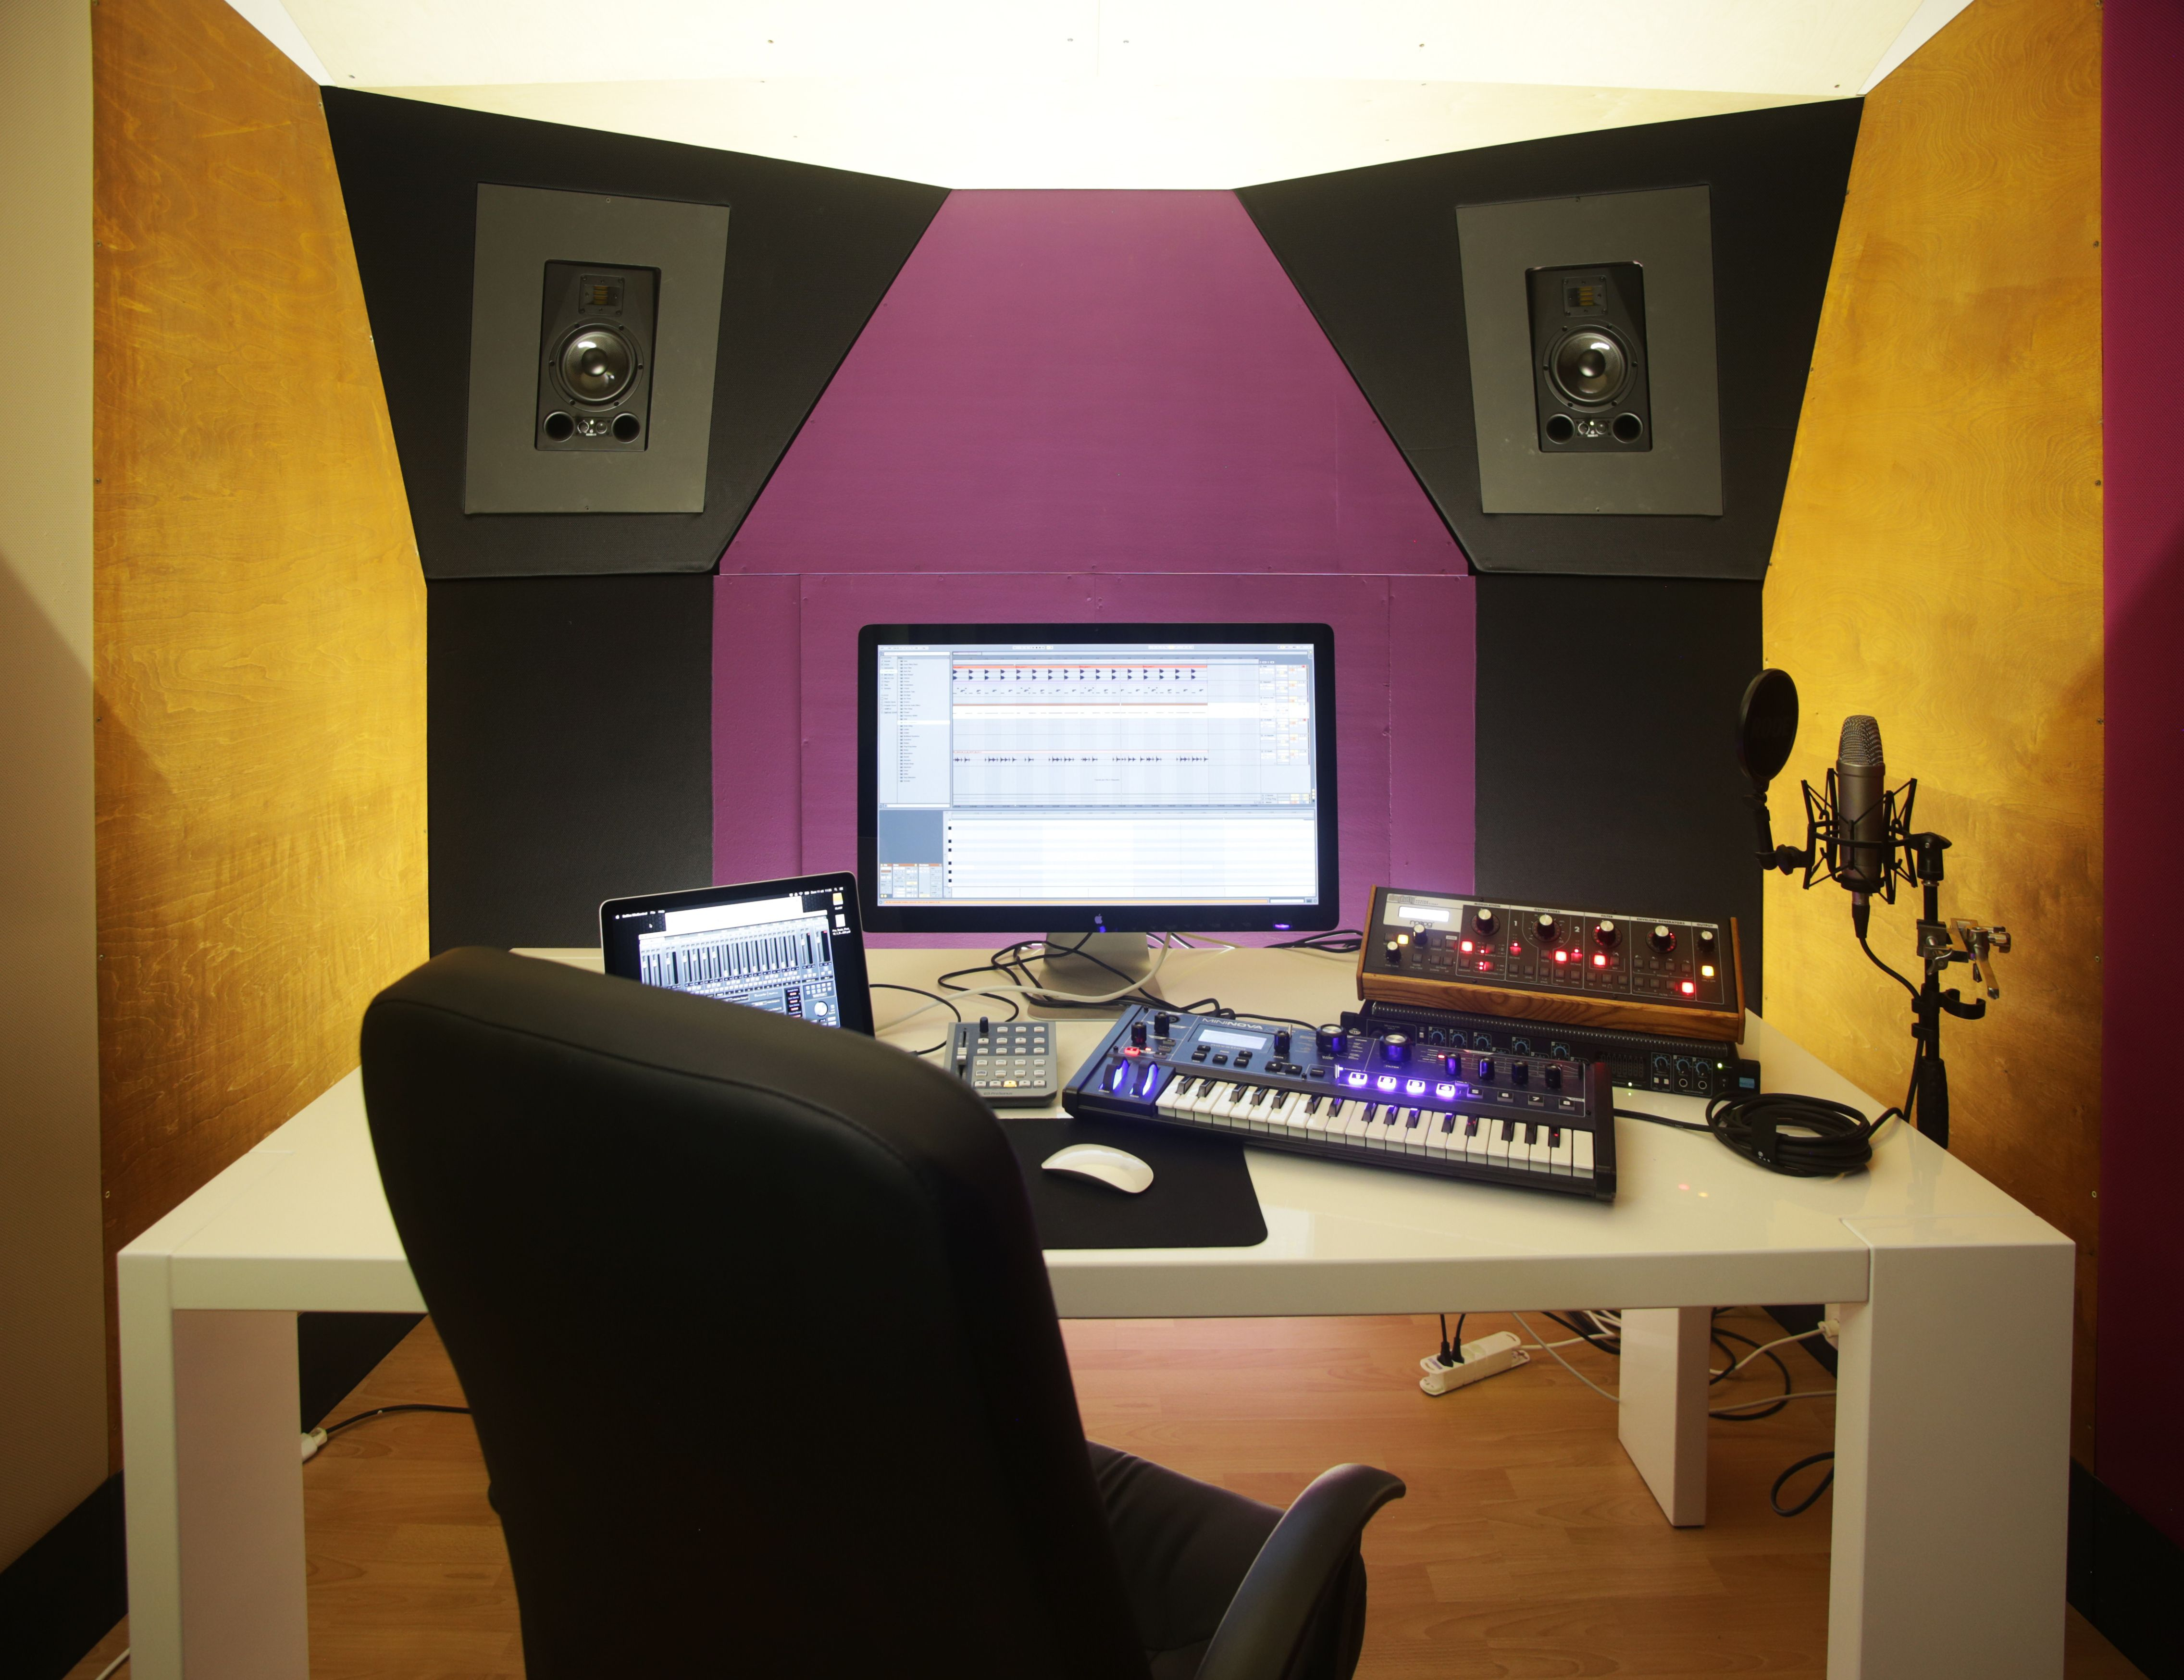 Studio di registrazione Pannelli acustici, Design